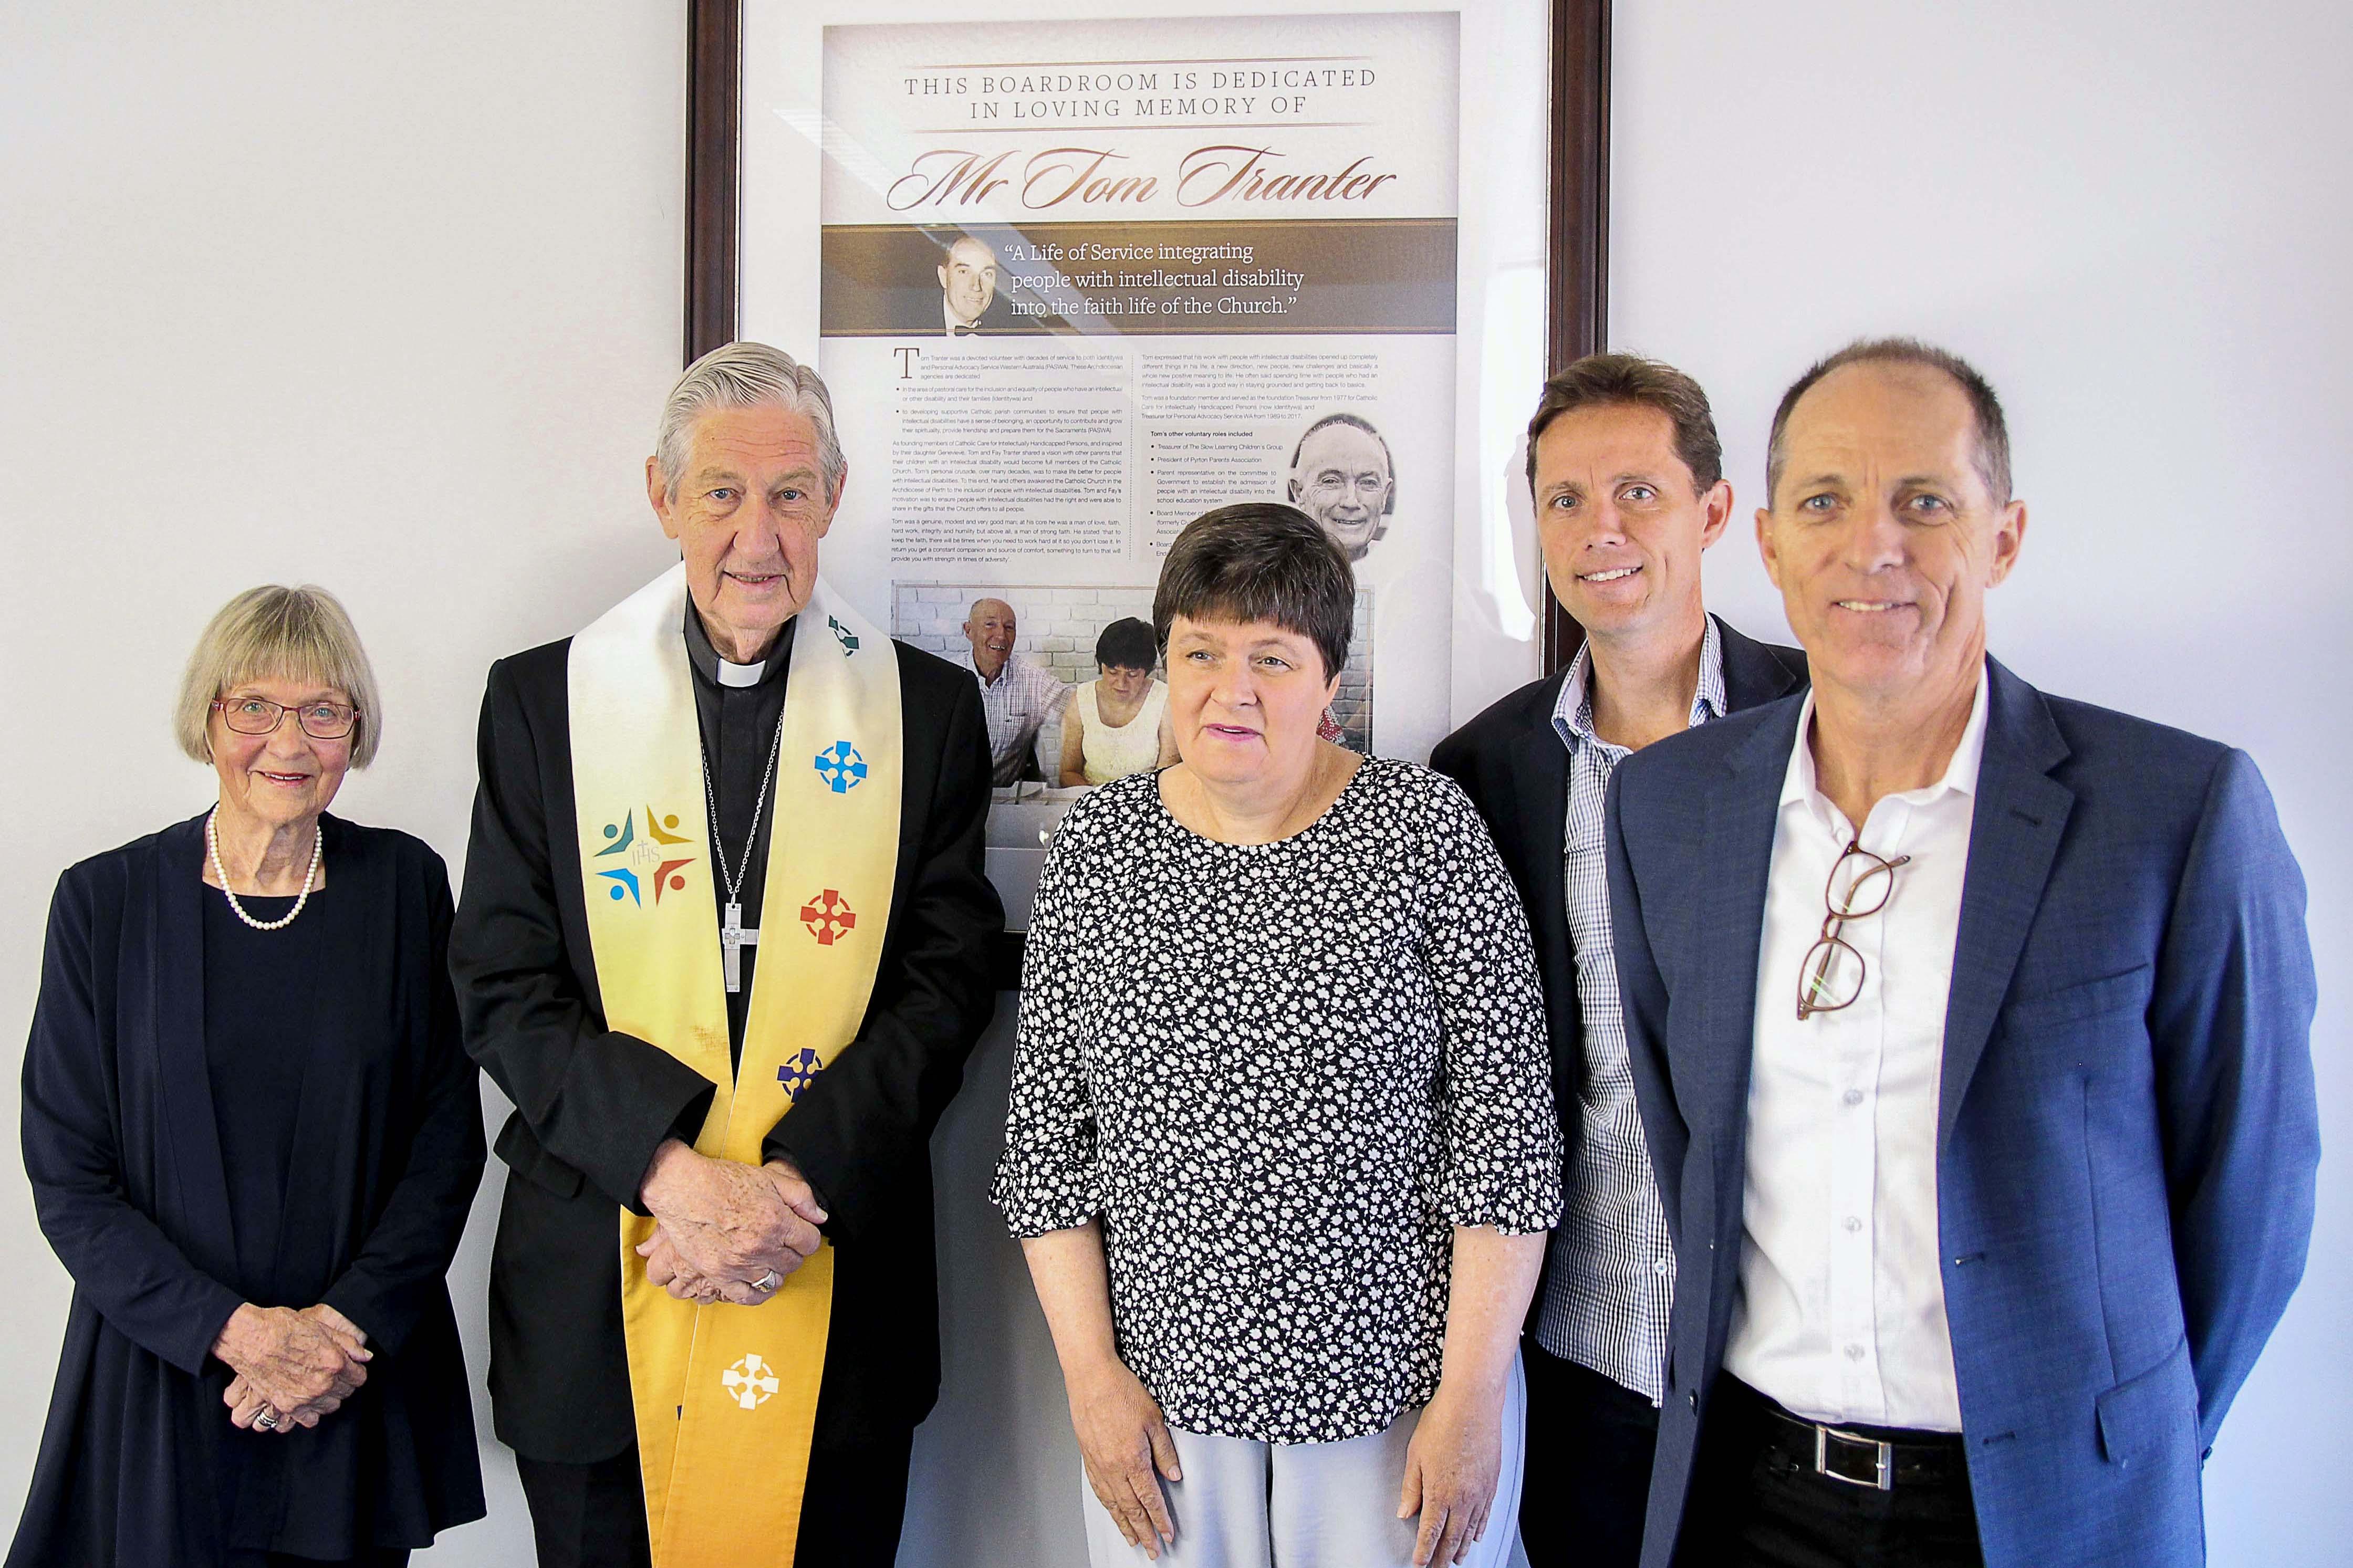 From left to right: Mrs Fay Tranter, Emeritus Archbishop Barry Hickey, Ms Genevieve Tranter, Mr James Tranter and Matthew Tranter. Photo: Identitywa.